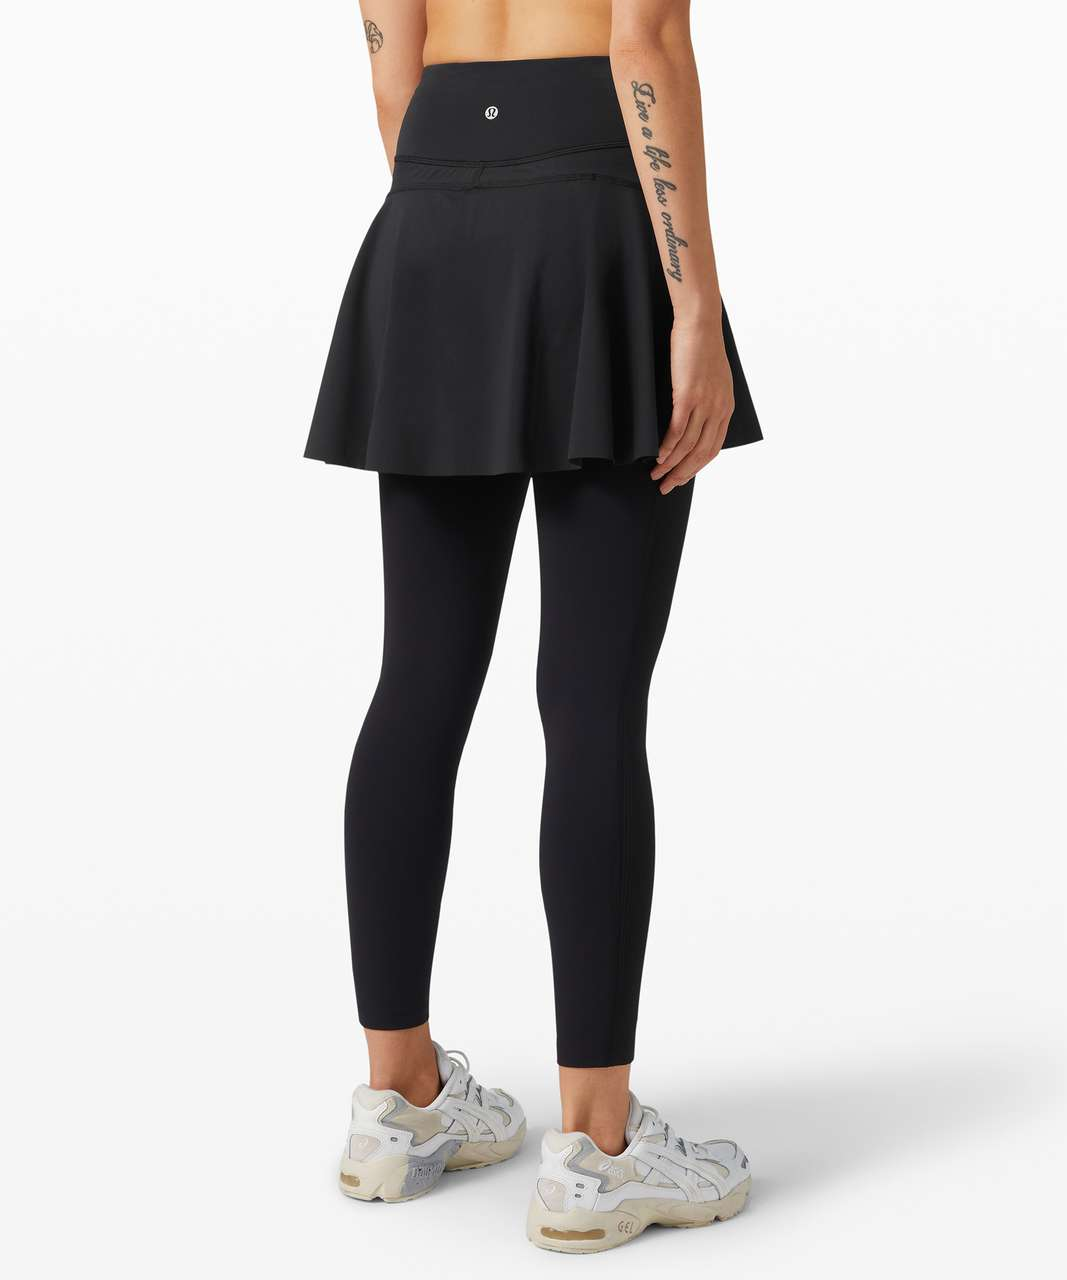 Lululemon Your Serve High Rise Skirt Tight 25 Black Lulu Fanatics